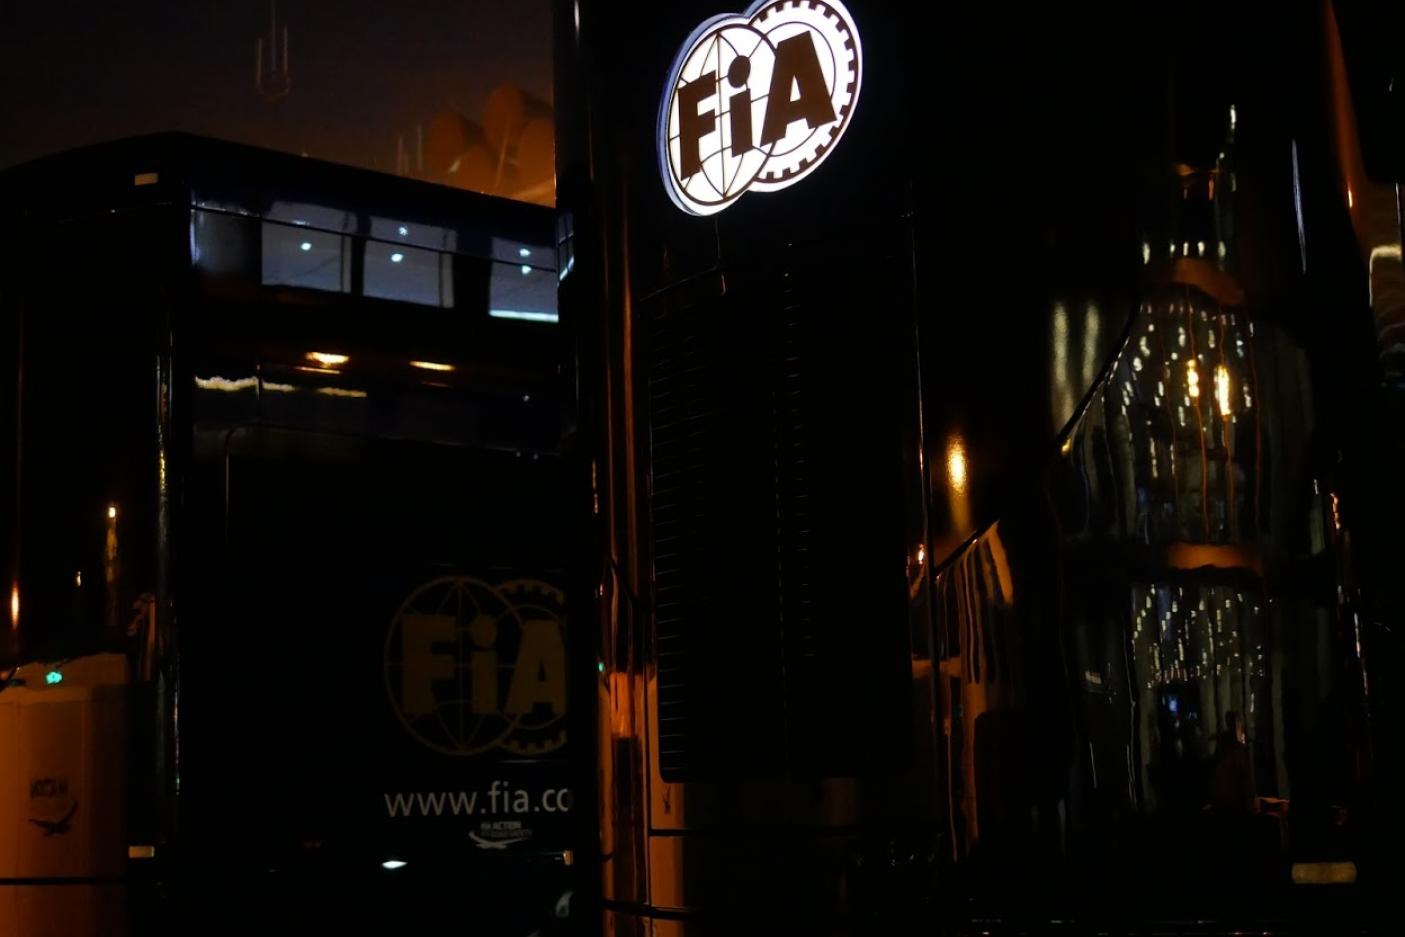 © Motors Inside - Les camions de la FIA dans le paddock